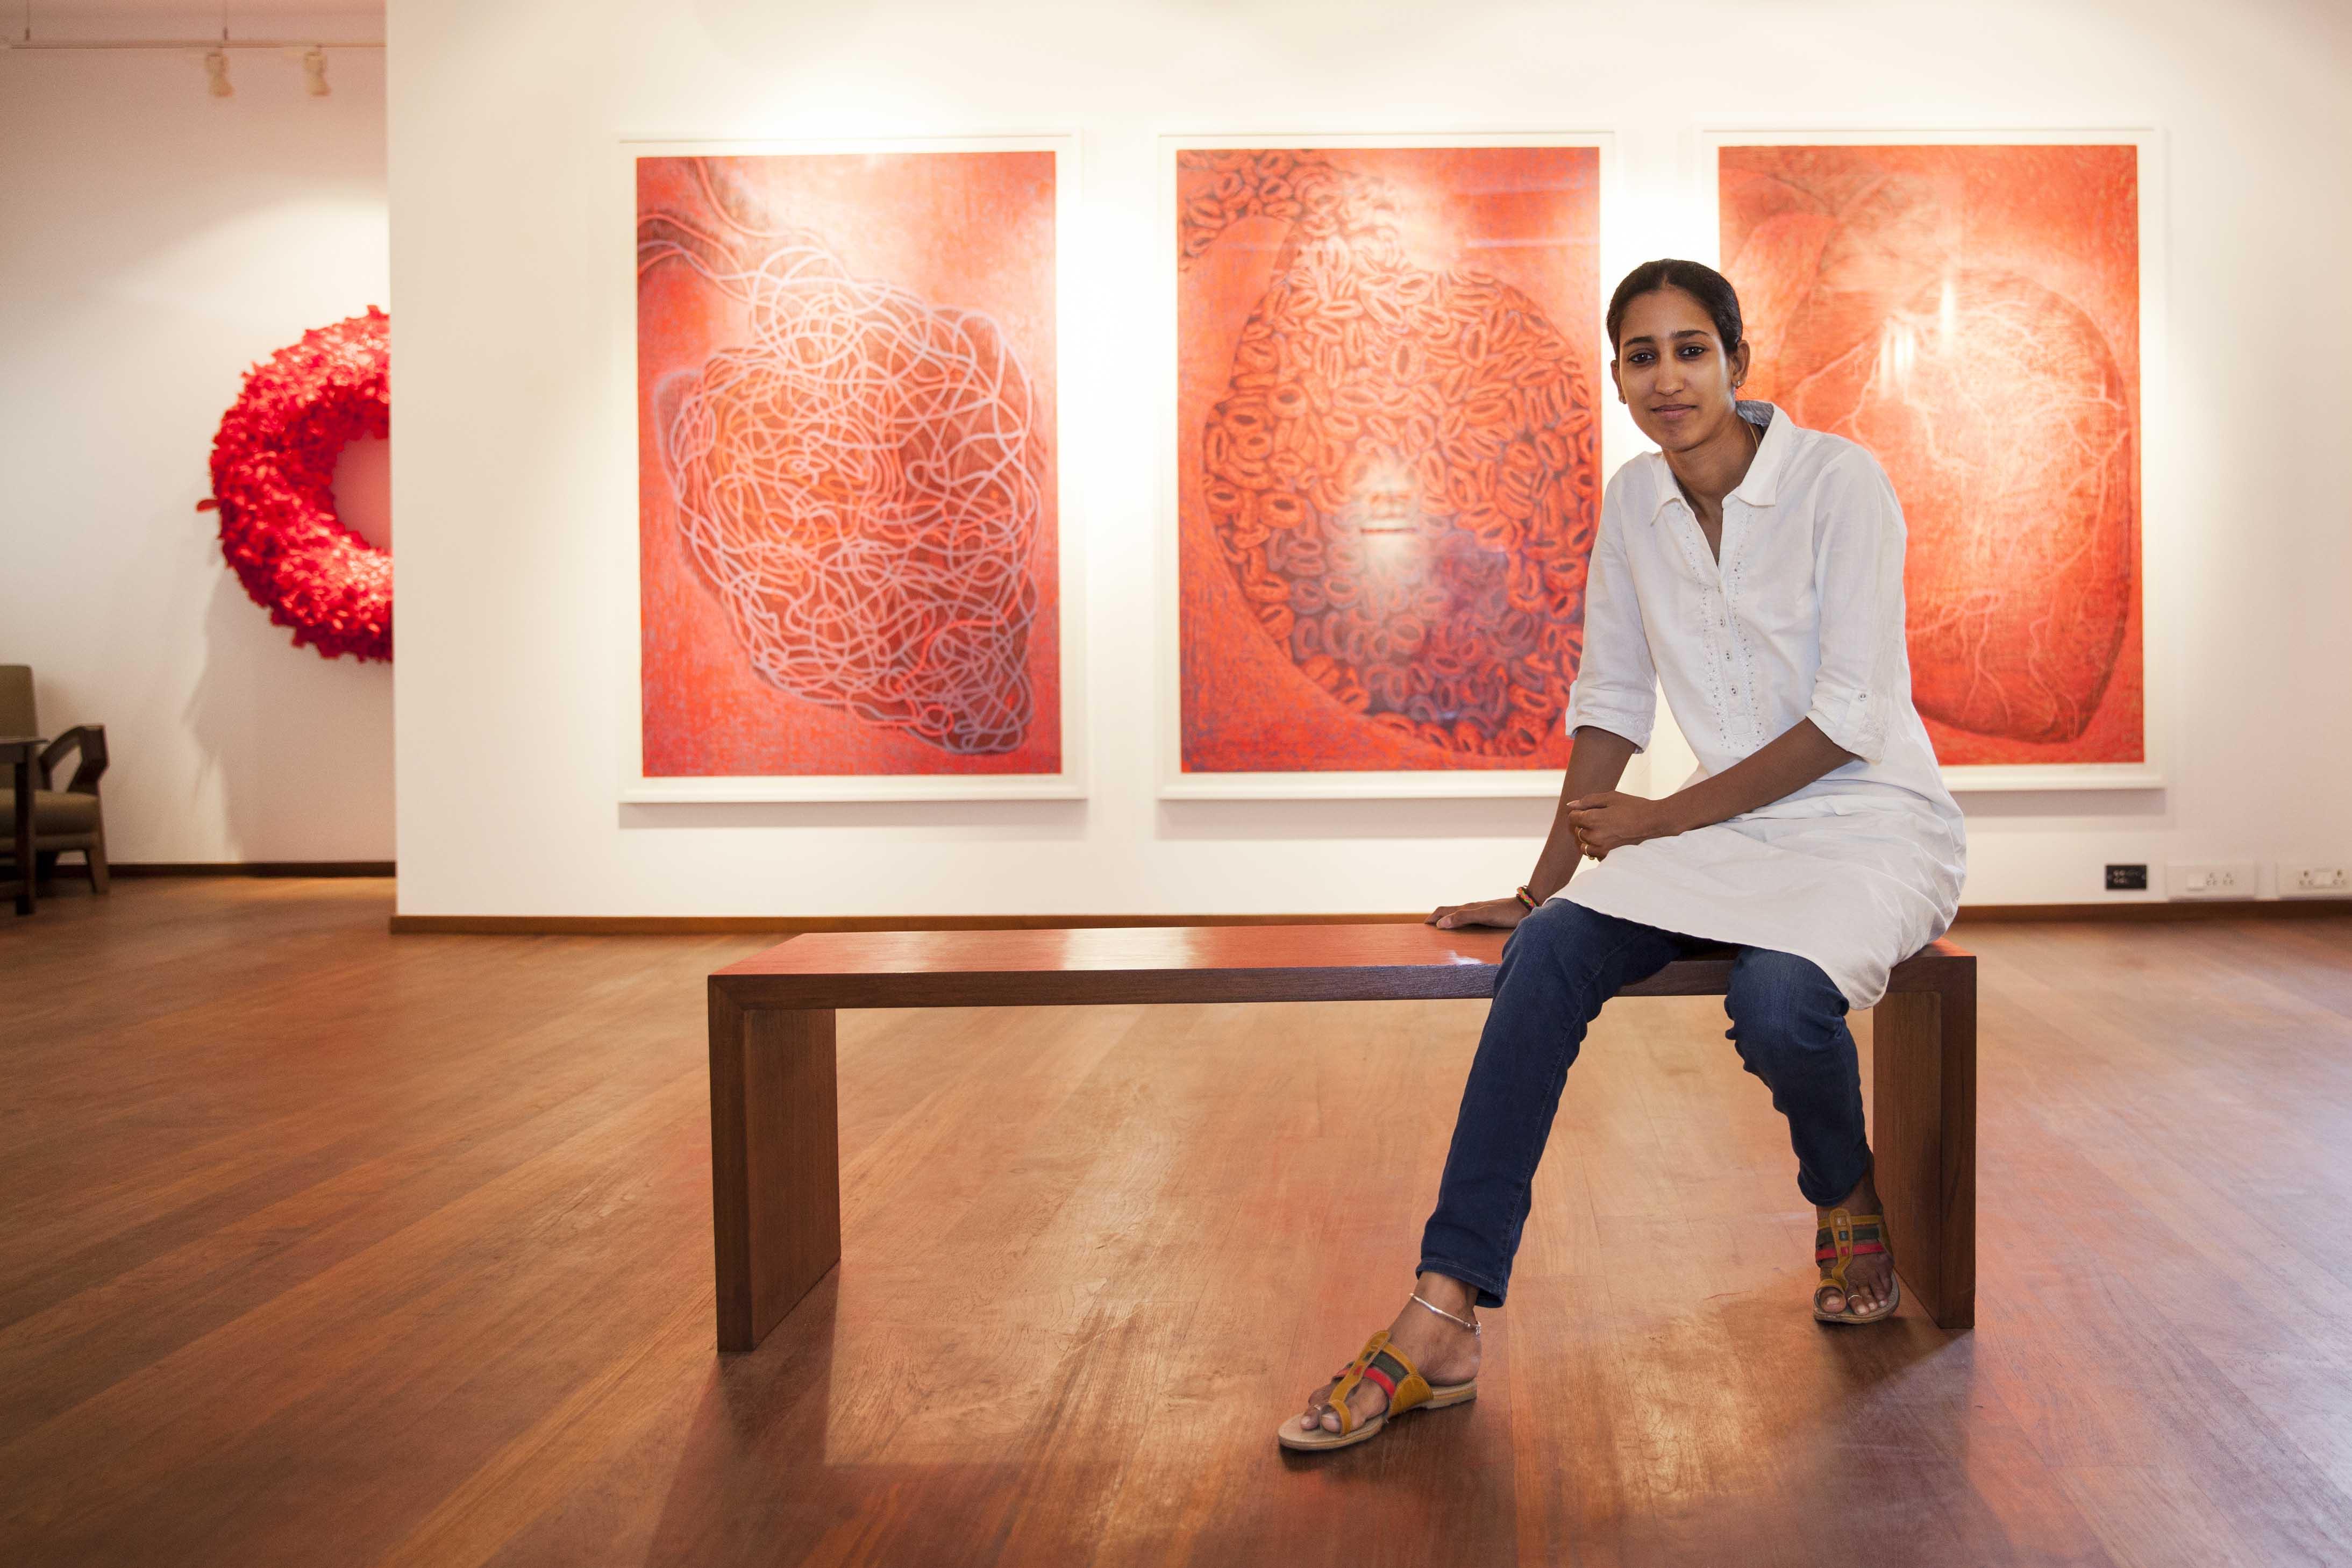 Soghra Khurasani's Visceral Art Pushes Us To See Beyond Skin